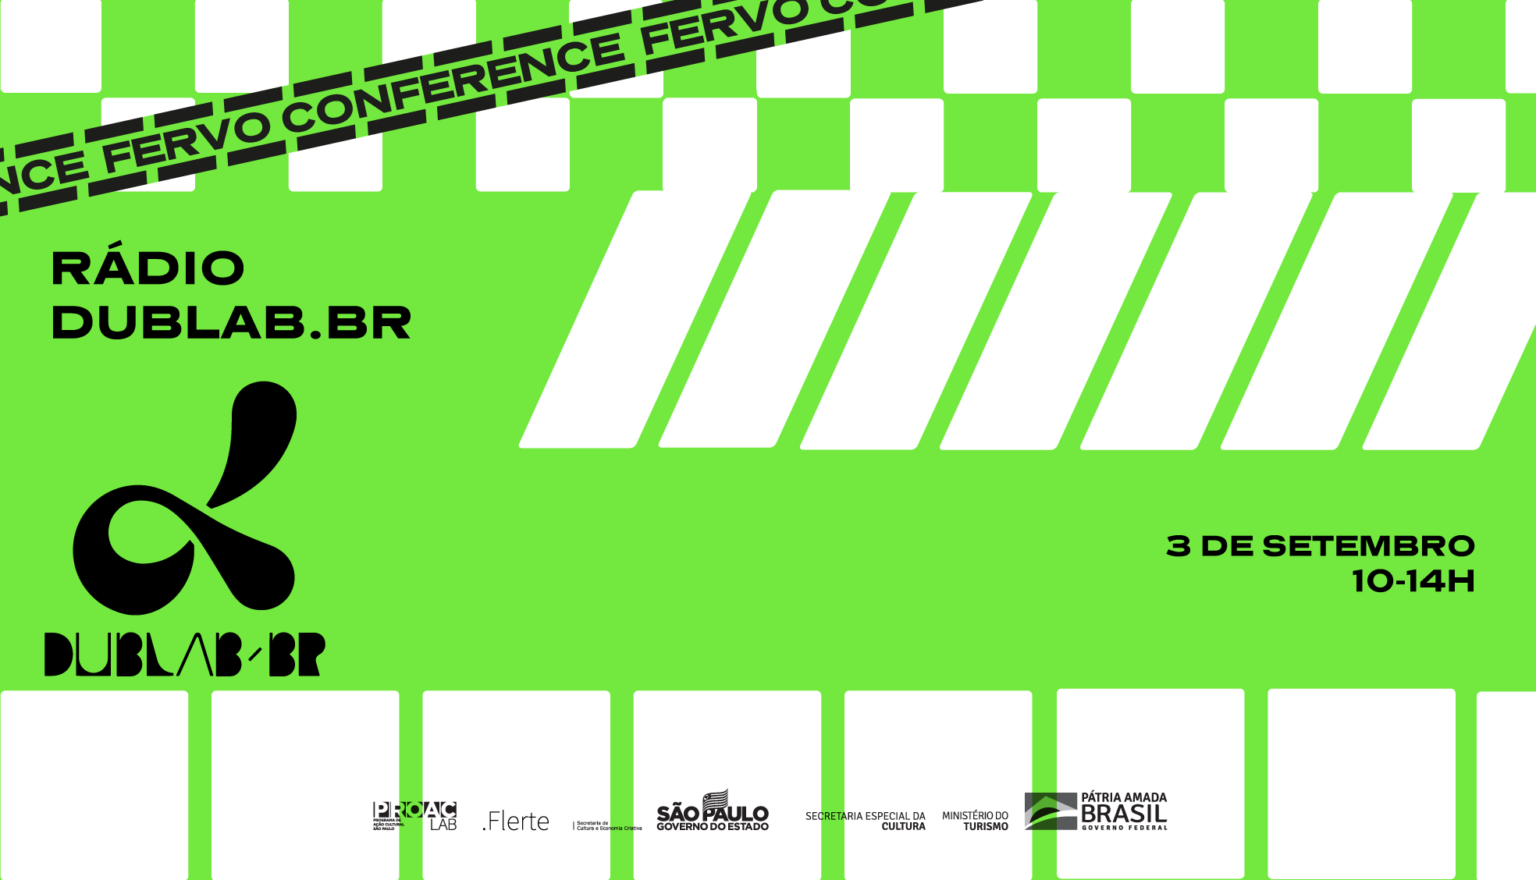 <b>dublab Brasil takeover Fervo Conference</b>